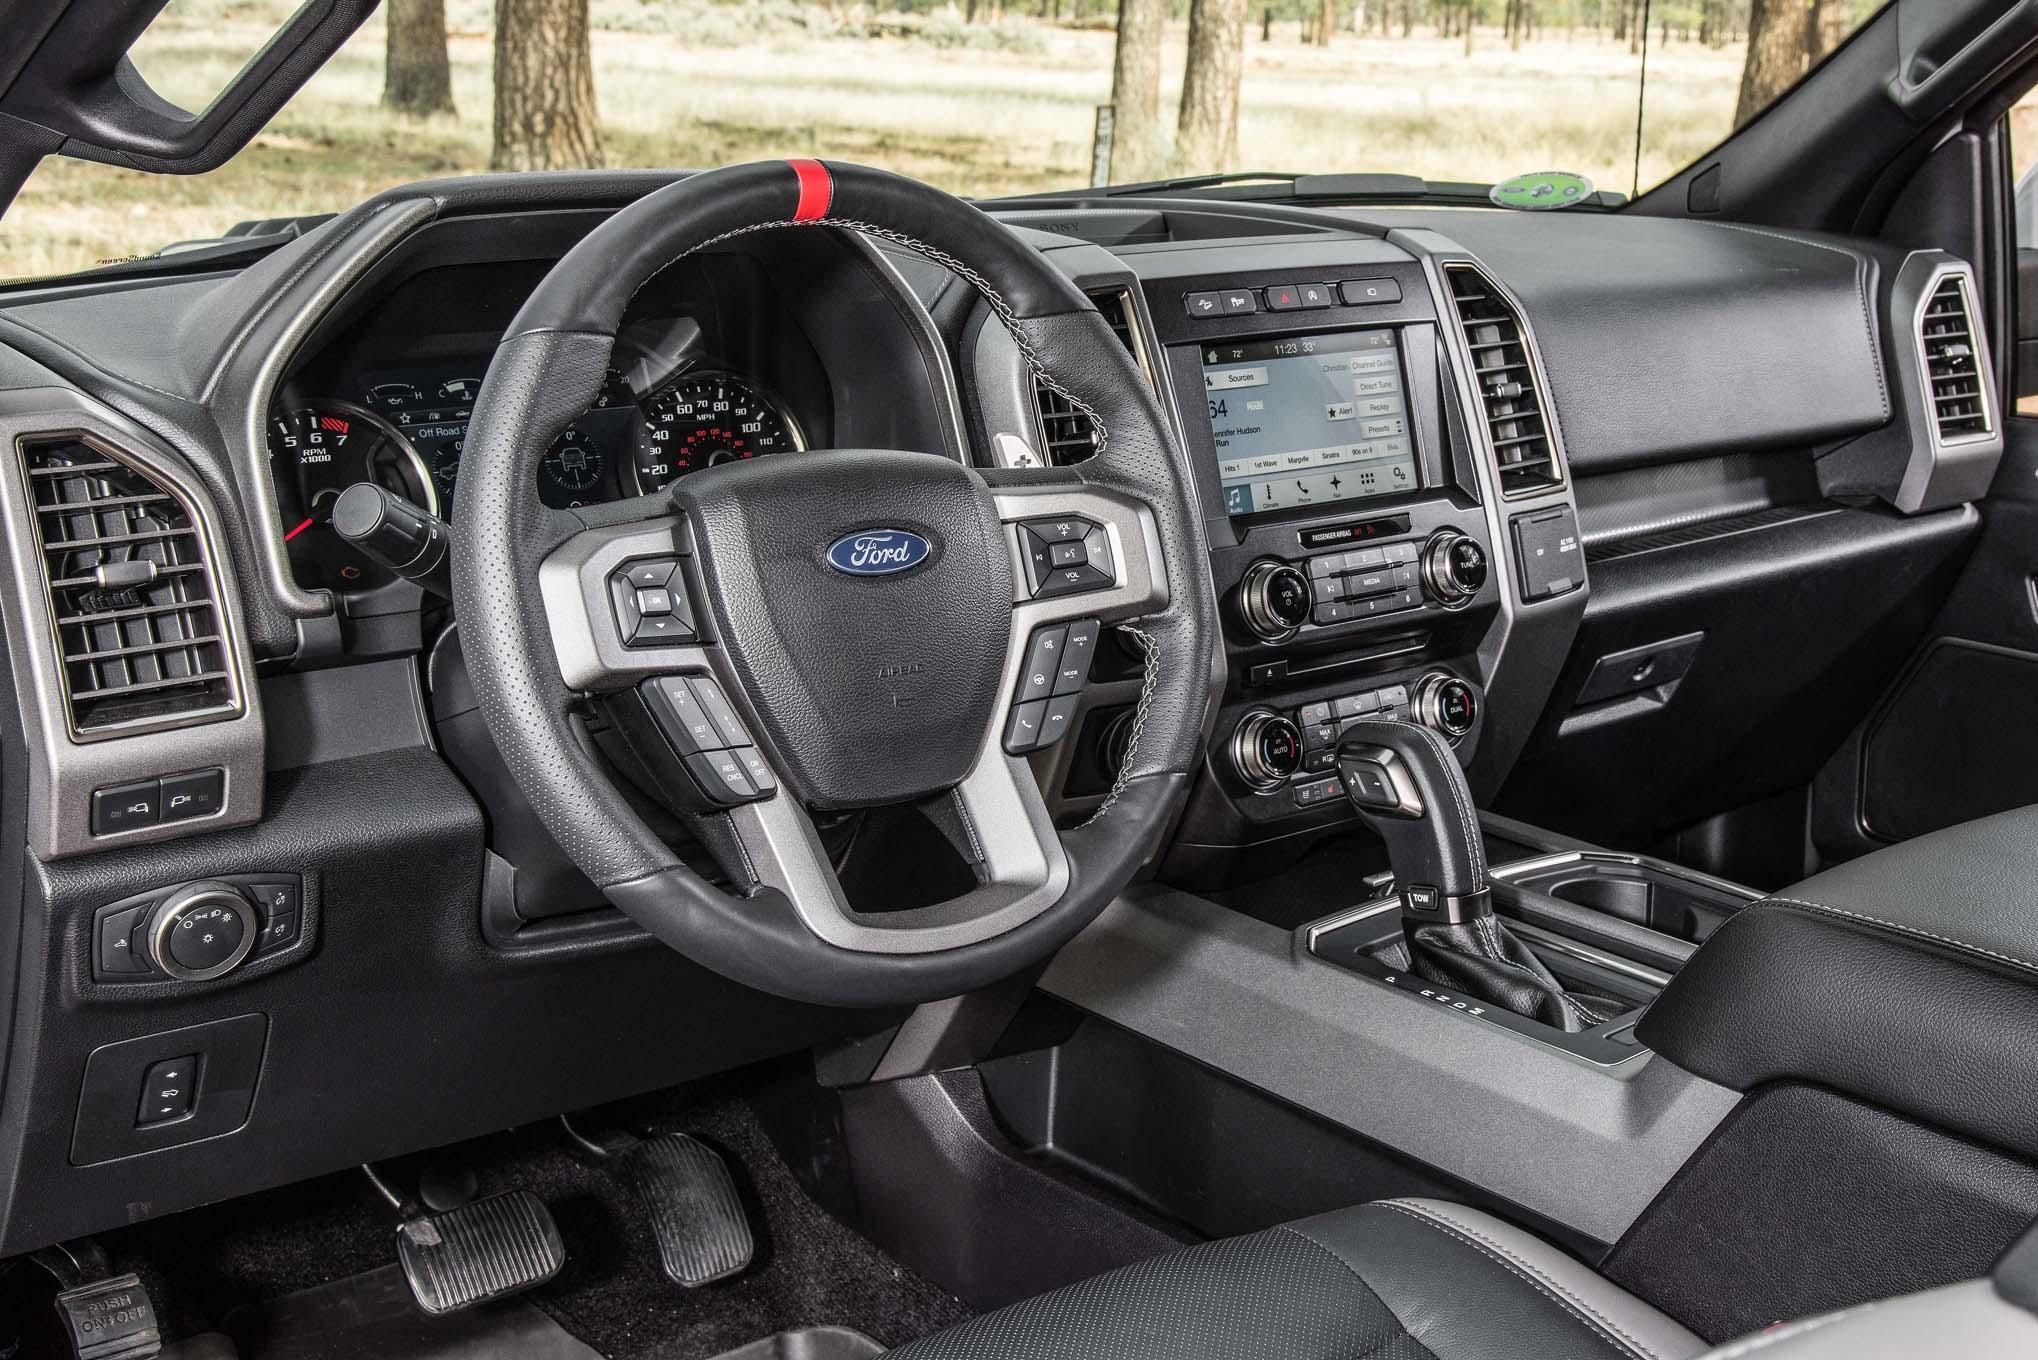 2018 Ford F150 Interior >> 2017-Ford-F-150-Raptor-interior - Motor Trend en Español